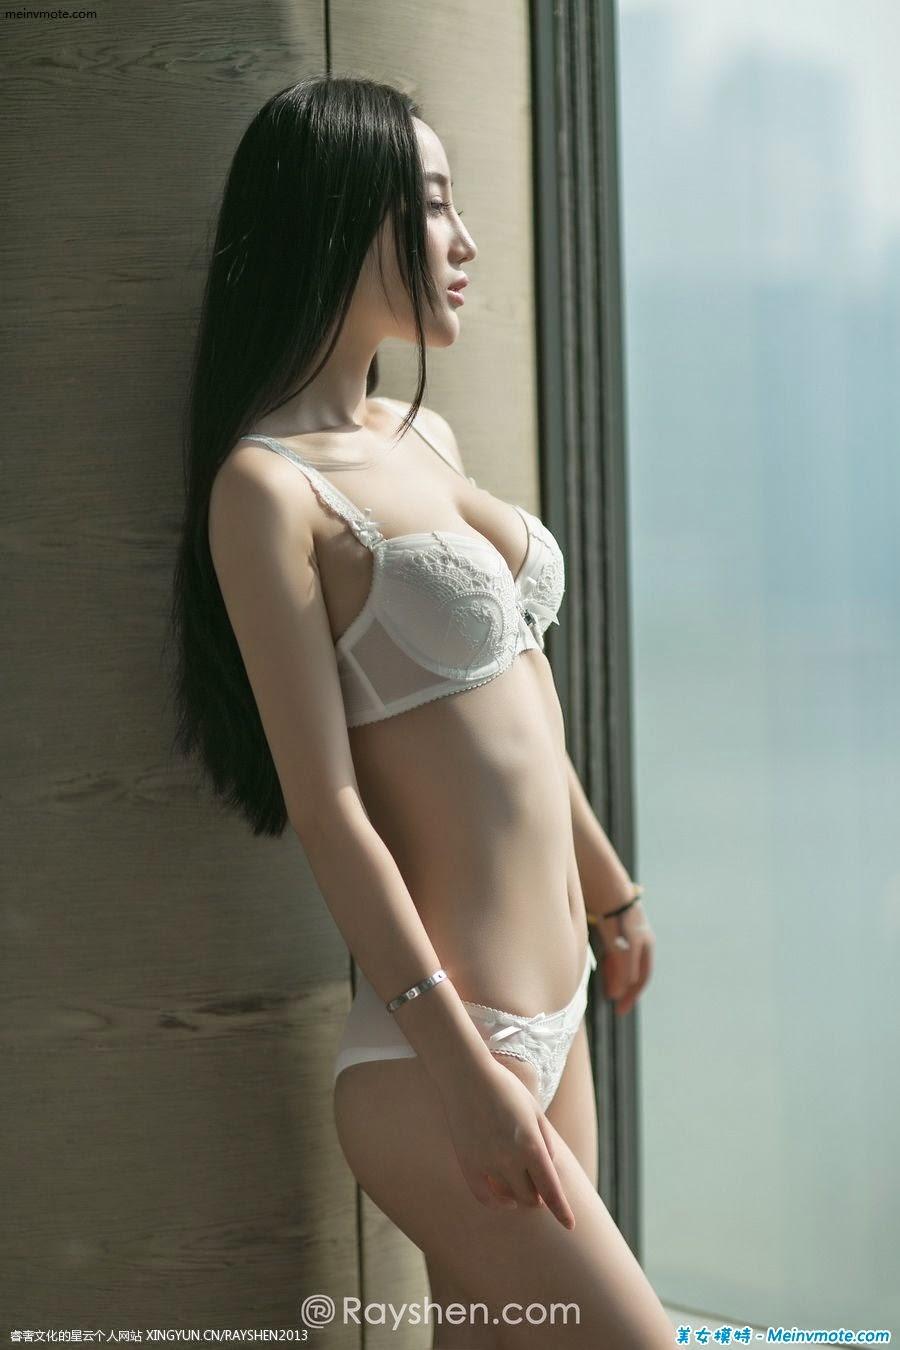 Zhang Wanxin window overlooking the beautiful lace underwear